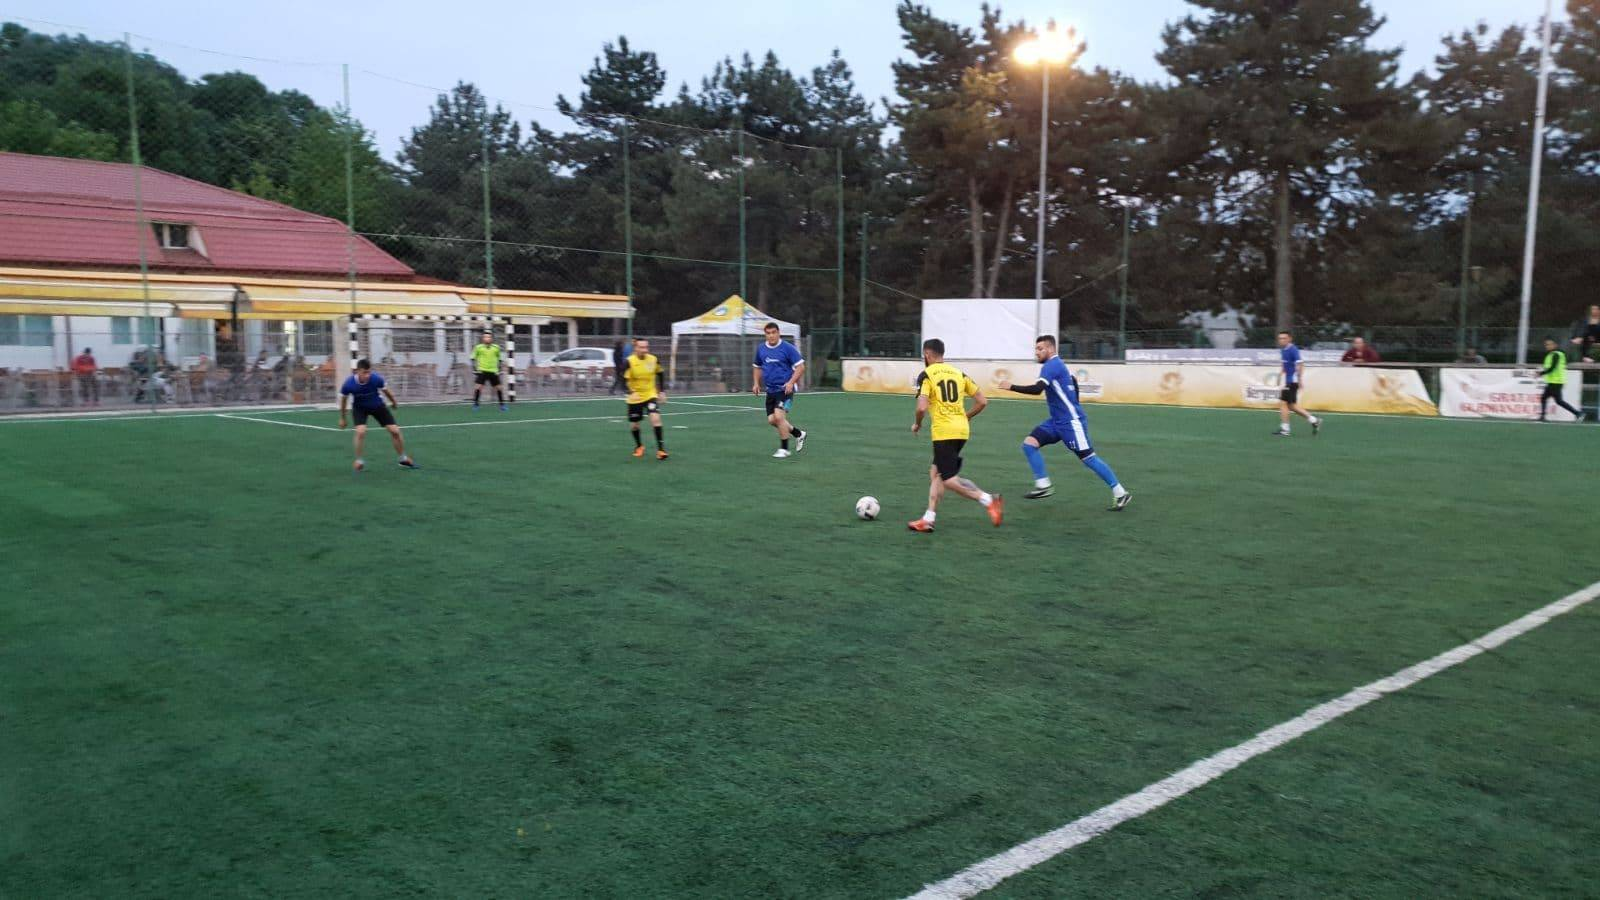 Avancronica finalei Cupei LMF Prahova 2018/Cine va câștiga trofeul: MFC sau Viking Pruszinski?